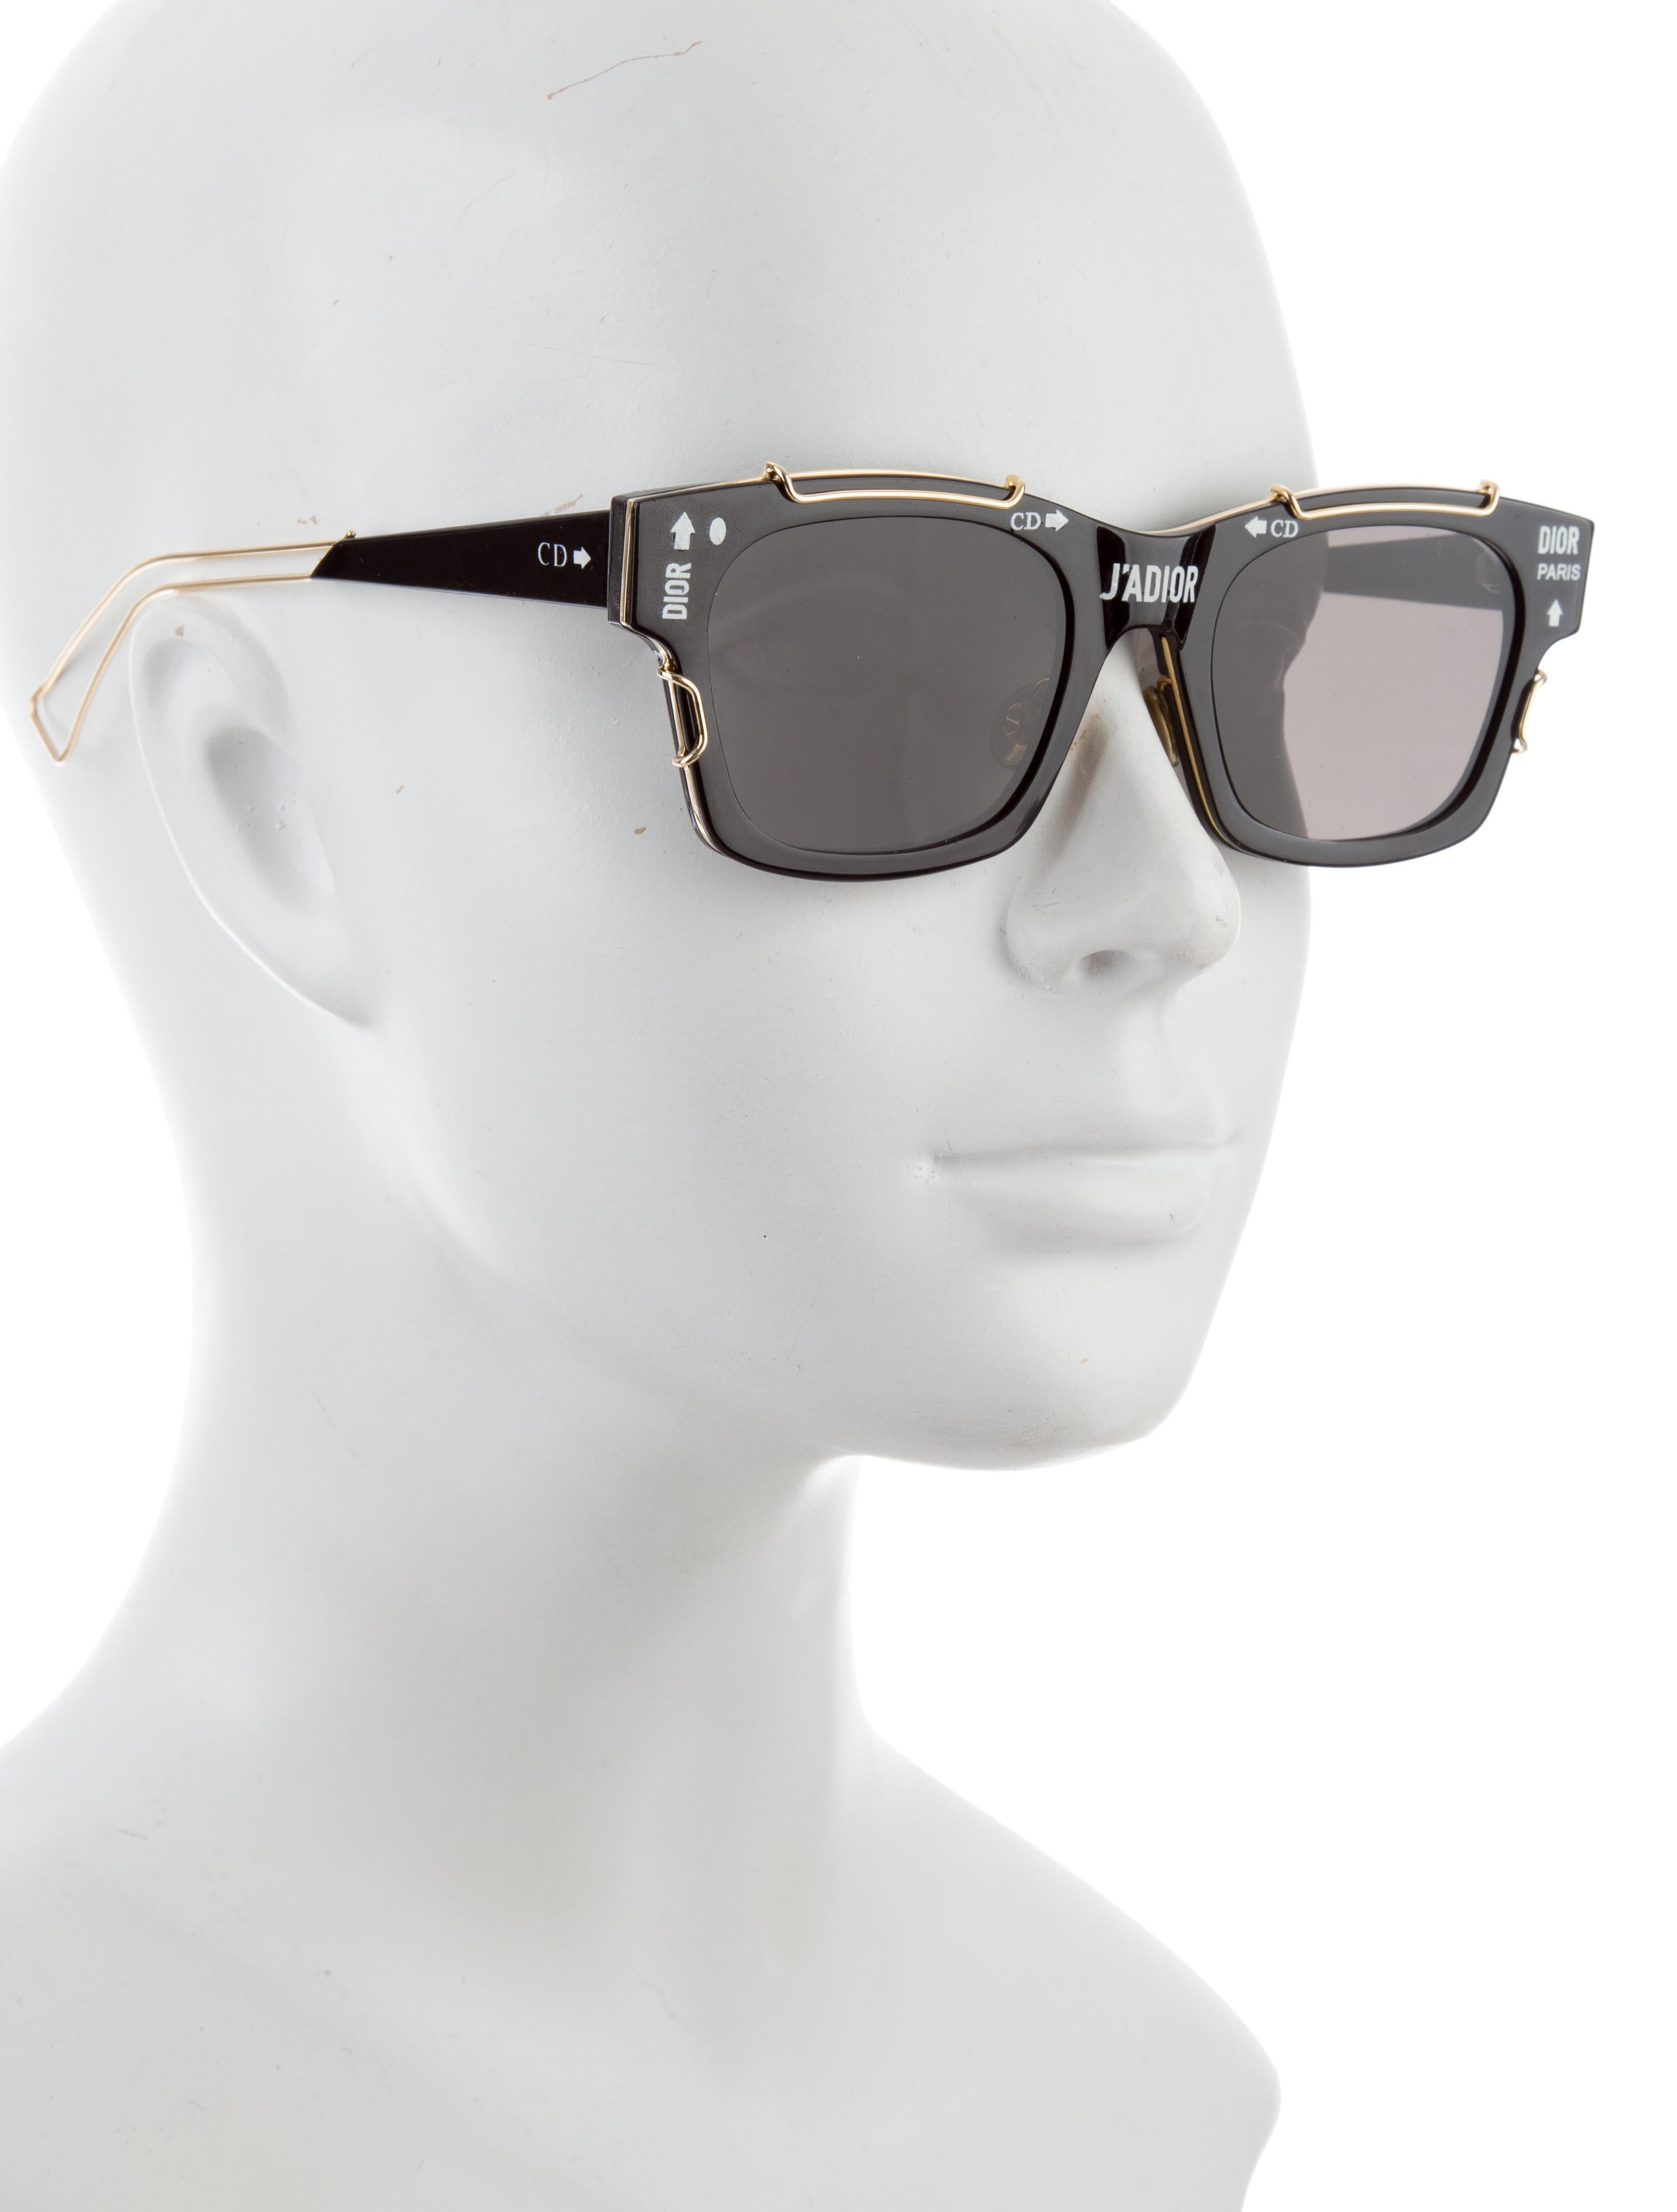 0c59a7ac3aa Dior Sunglasses 2018 Black